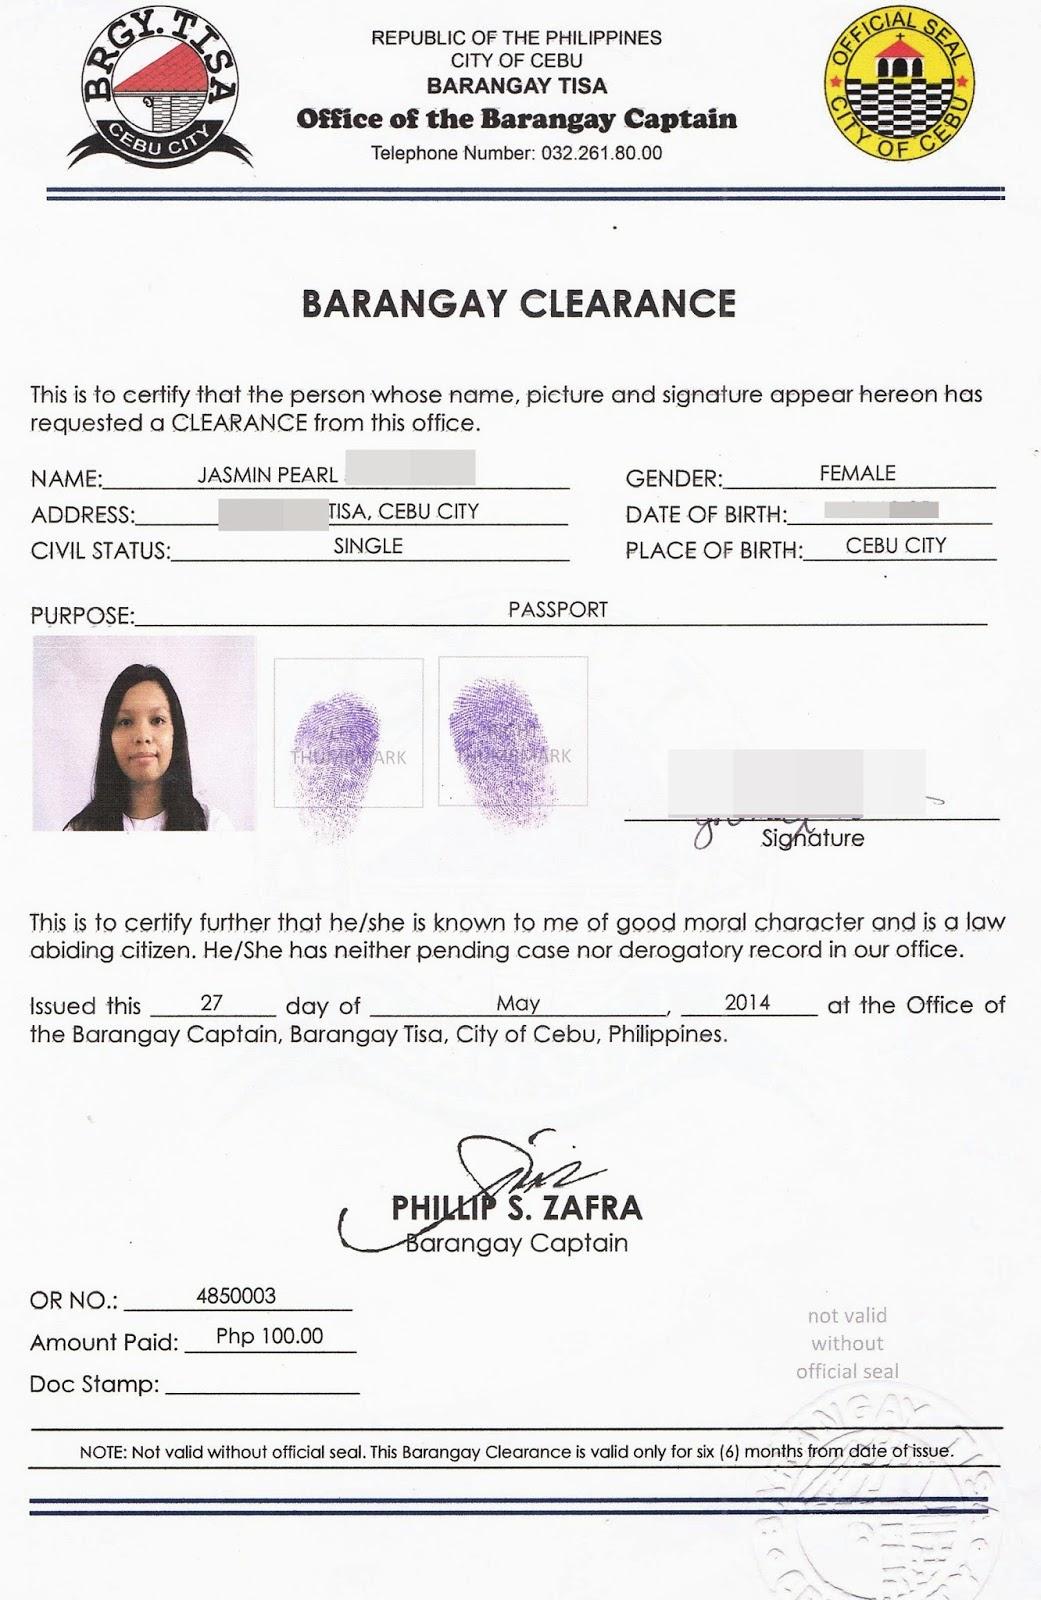 About NBI, police & barangay clearances